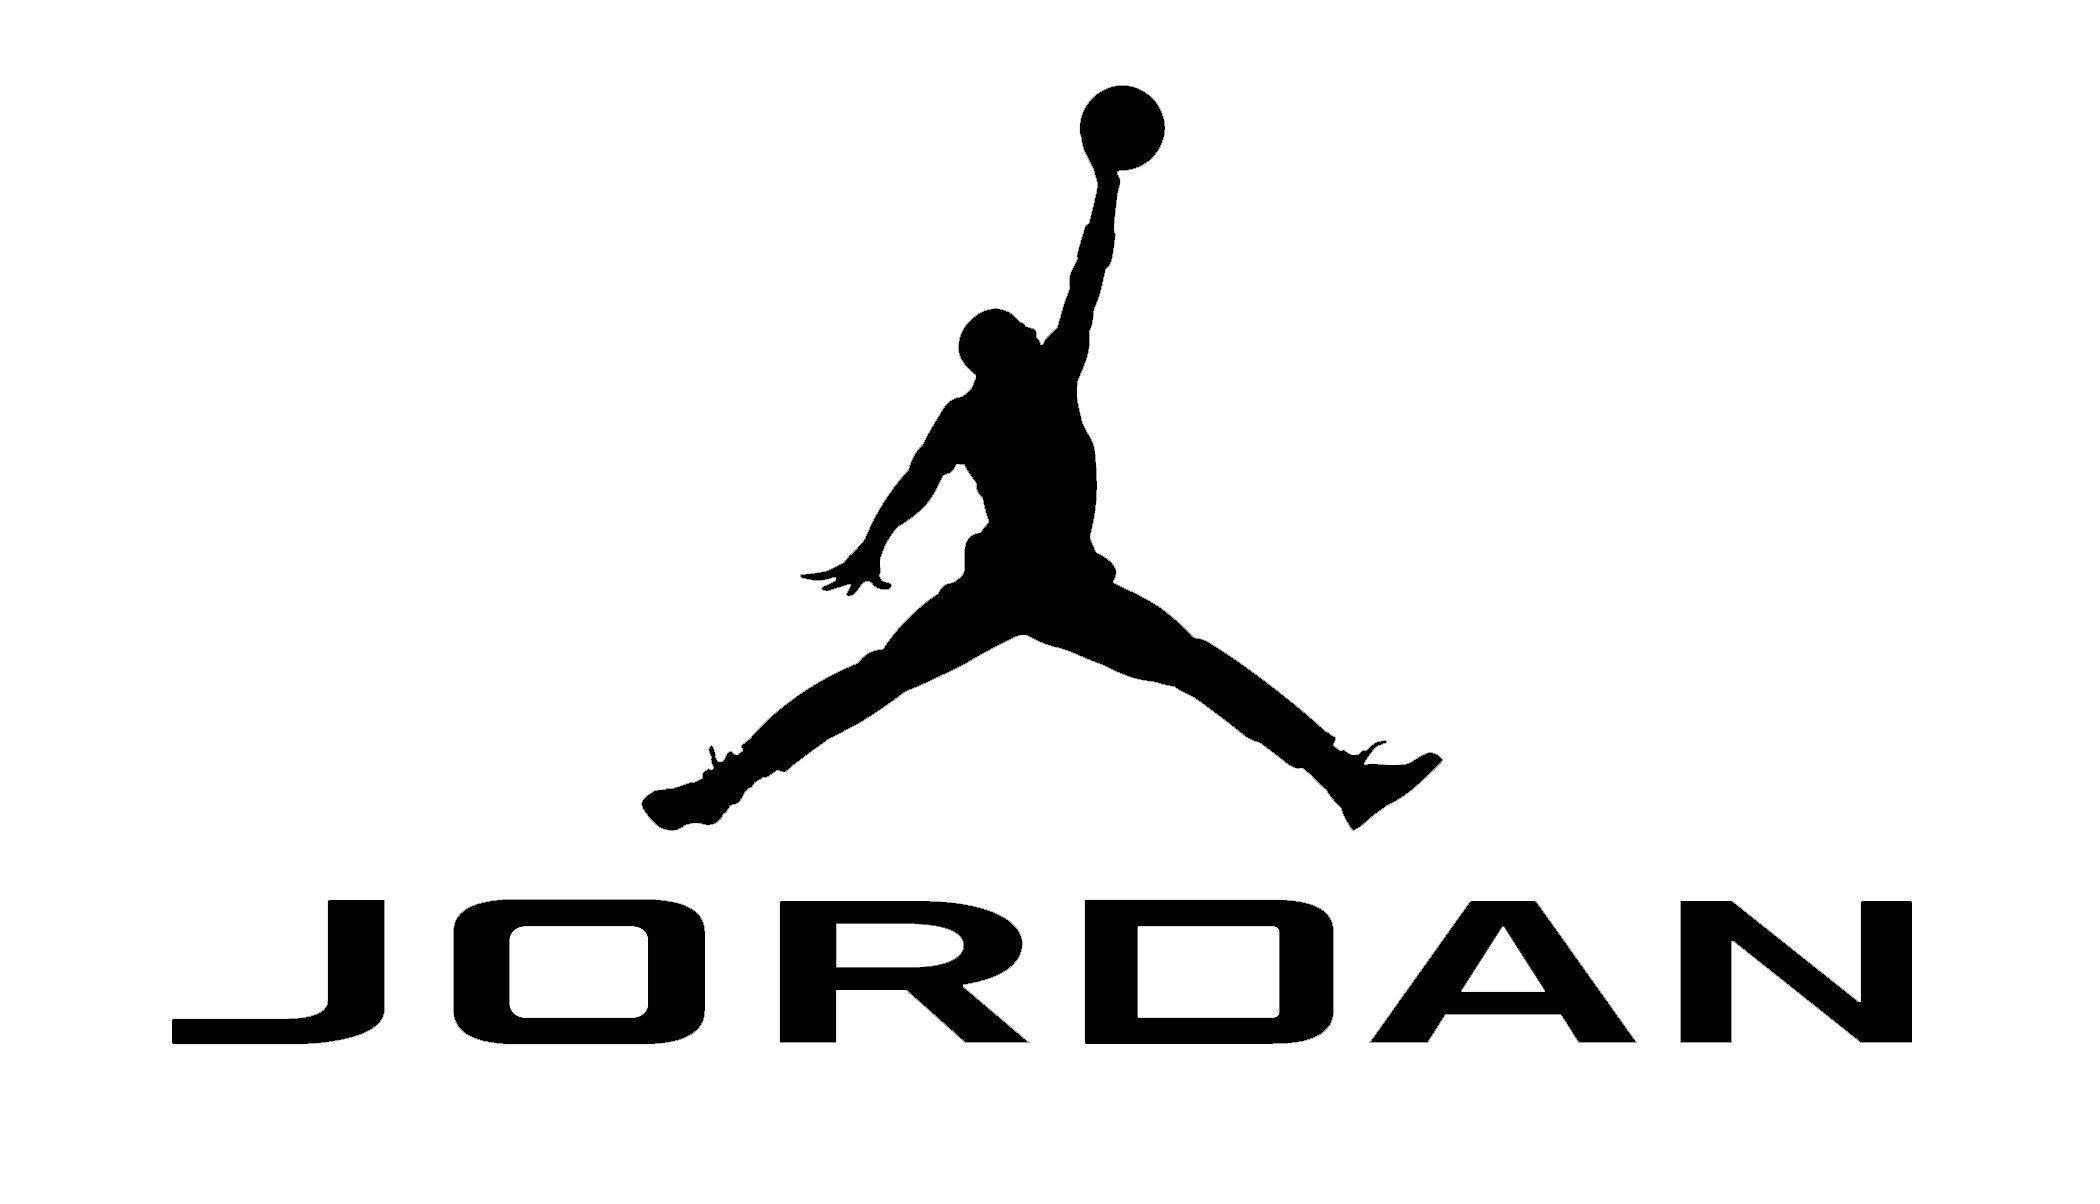 Jordan Brand Logo Logodix